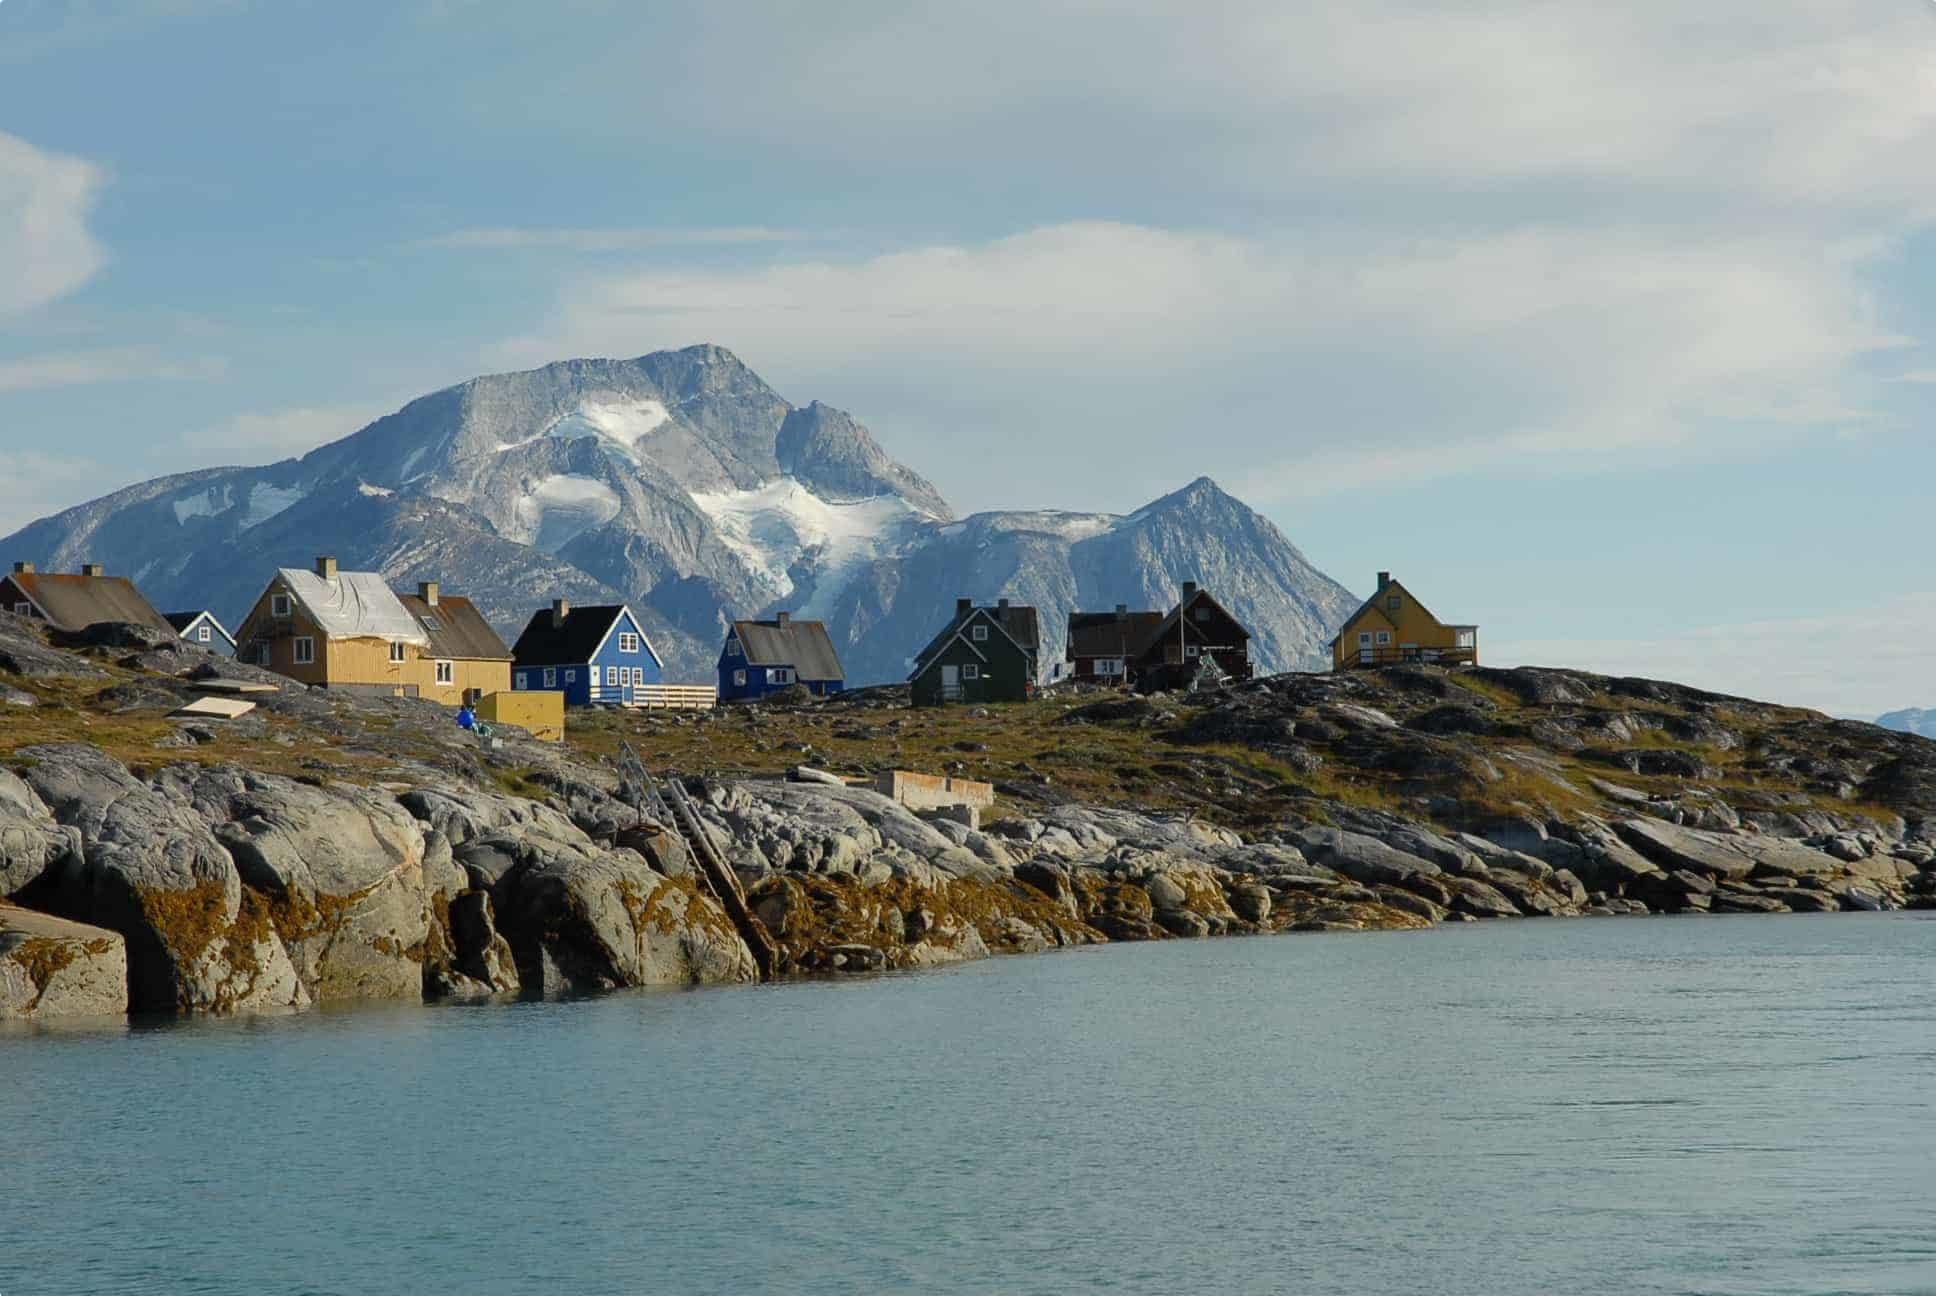 Qoornoq, Greenland